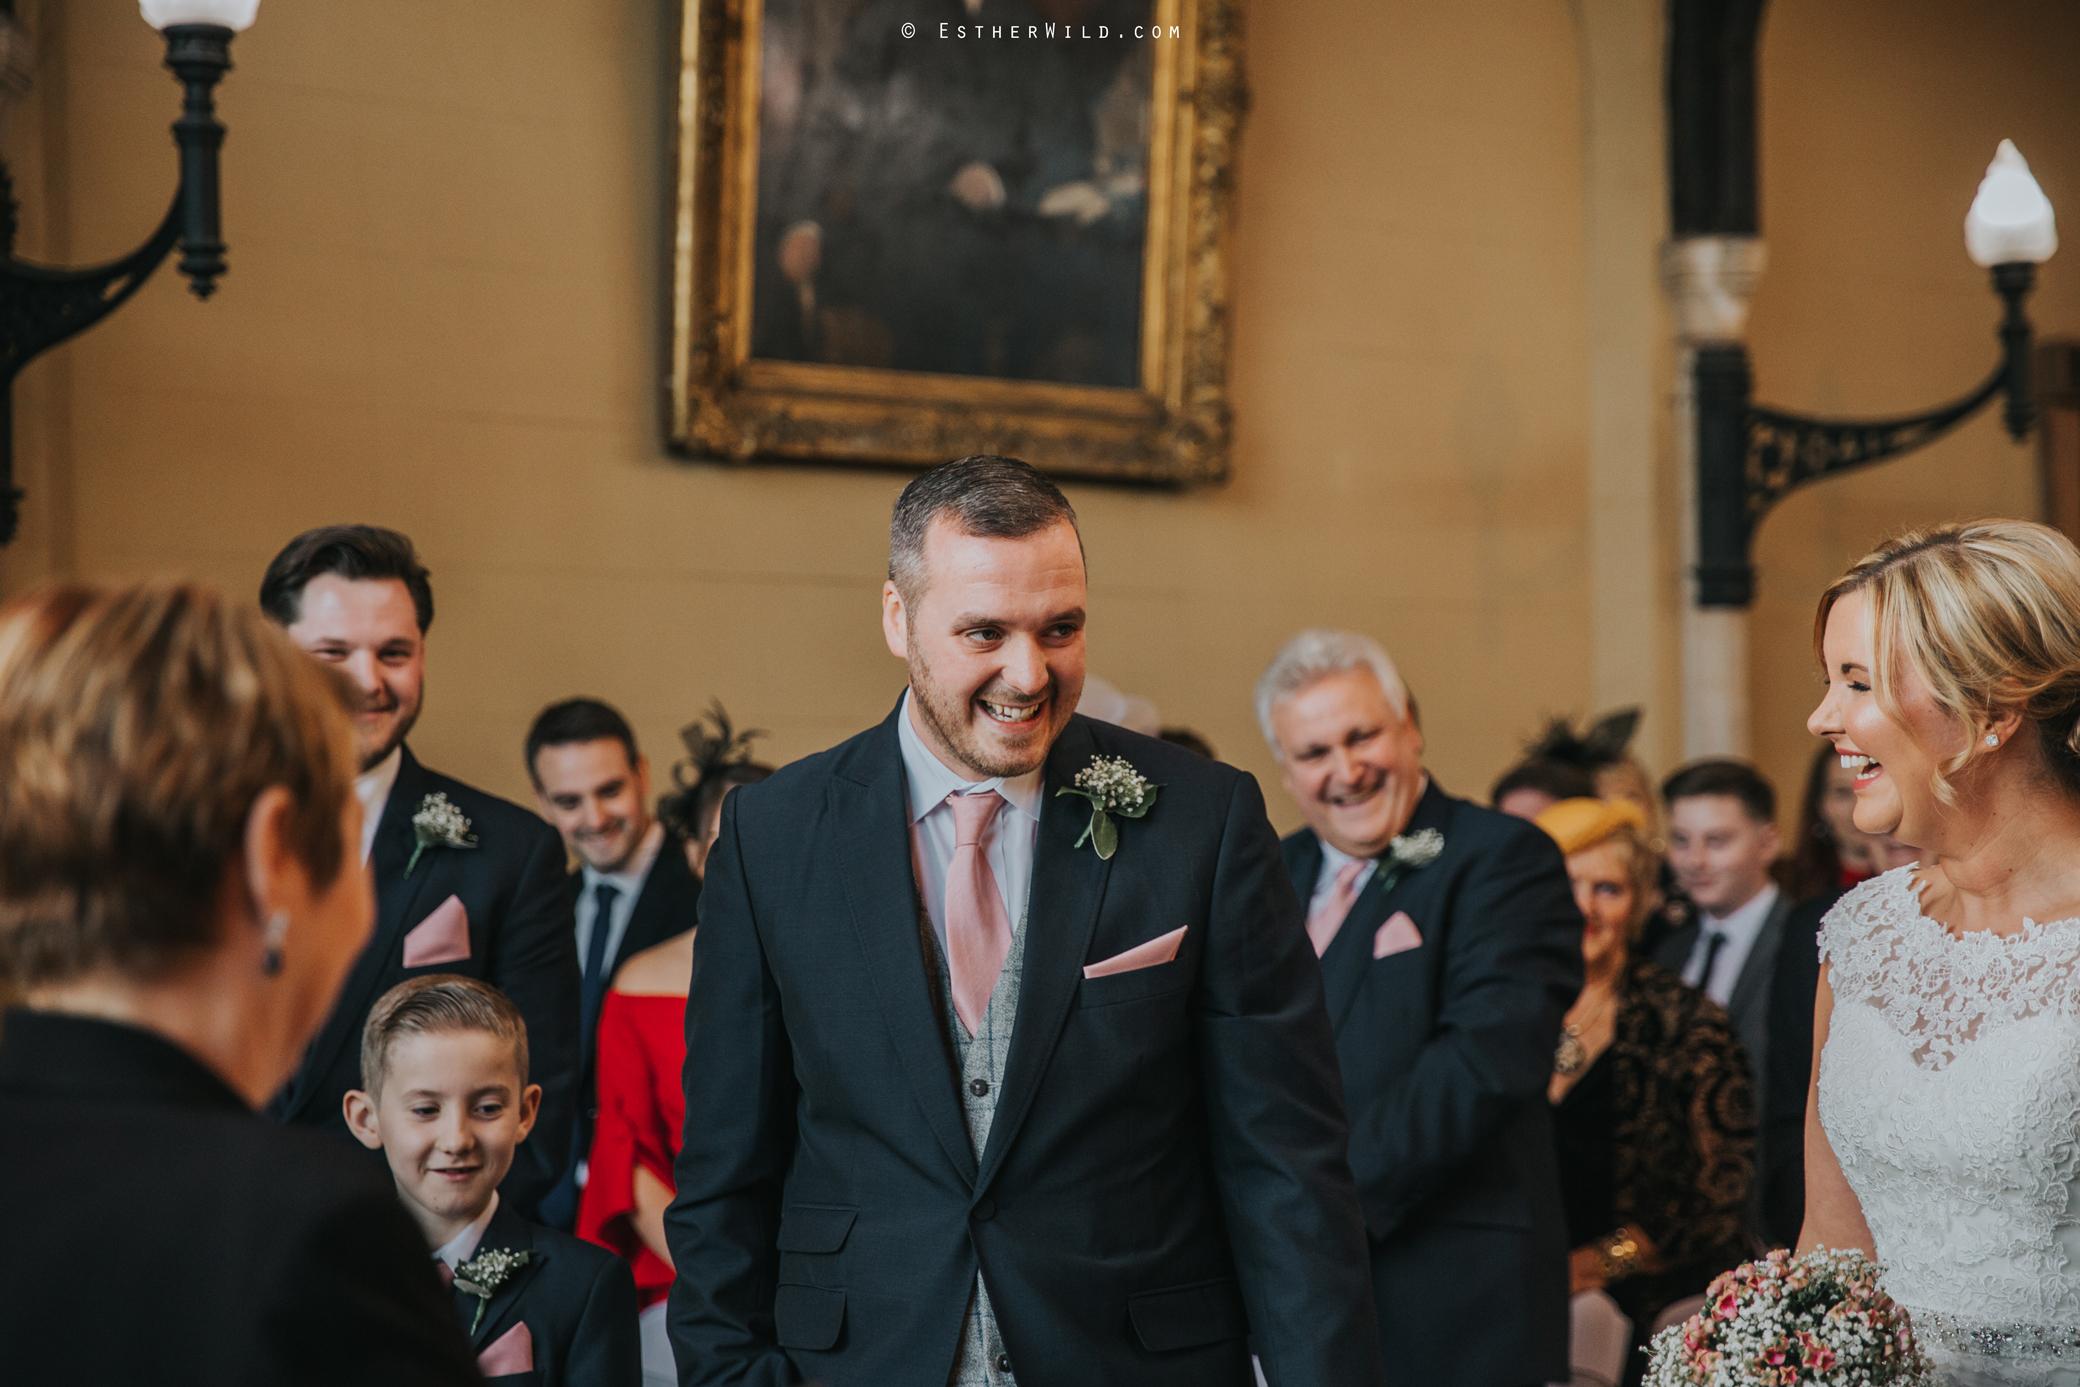 Wedding_Kings_Lynn_Town_Hall_Norfolk_Photographer_Esther_Wild_IMG_0938.jpg